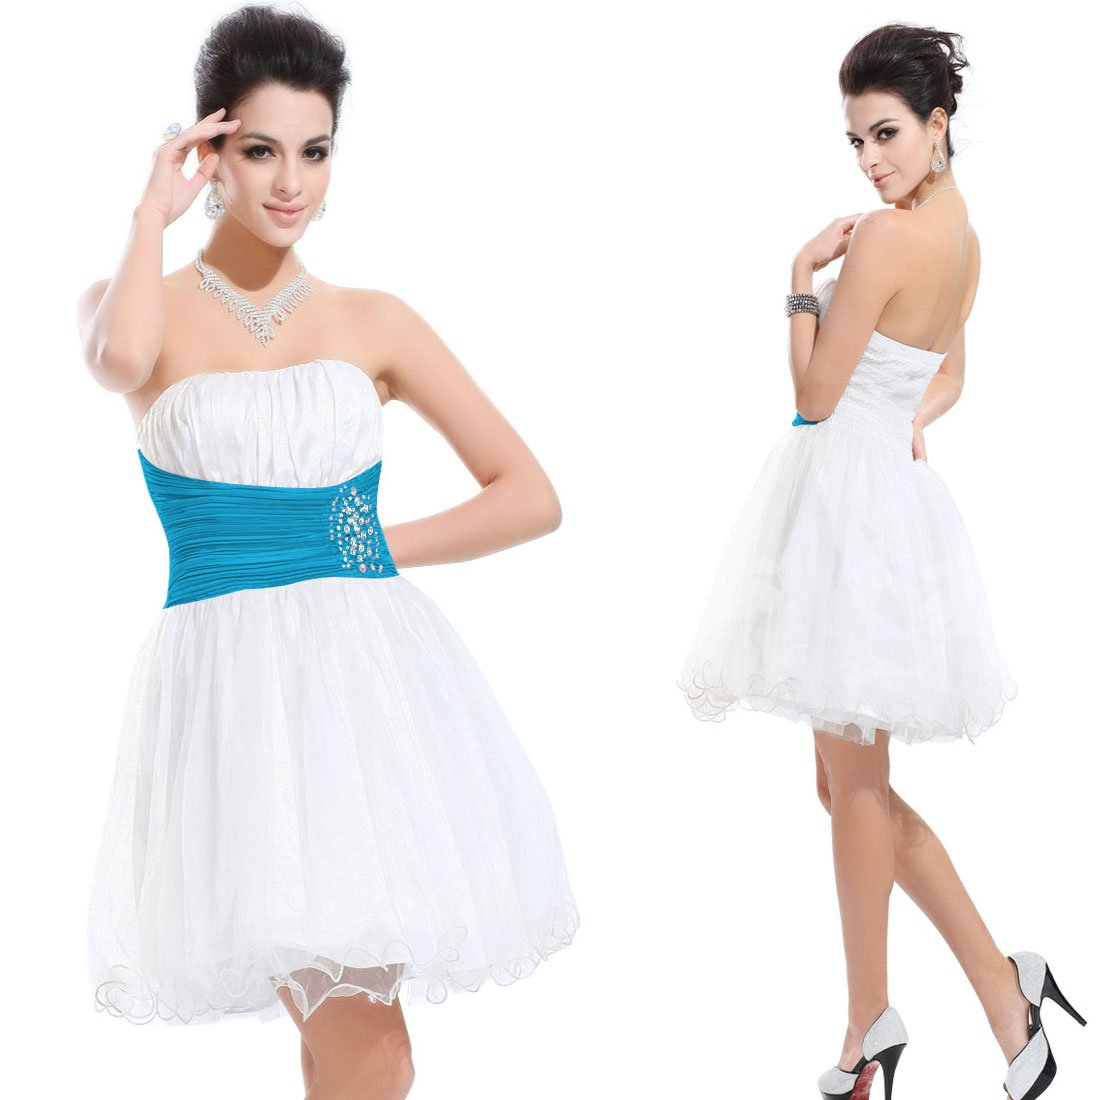 Chiffon dresses bridesmaid dresses under 50 dollars bridesmaid dresses under 50 dollars ombrellifo Image collections